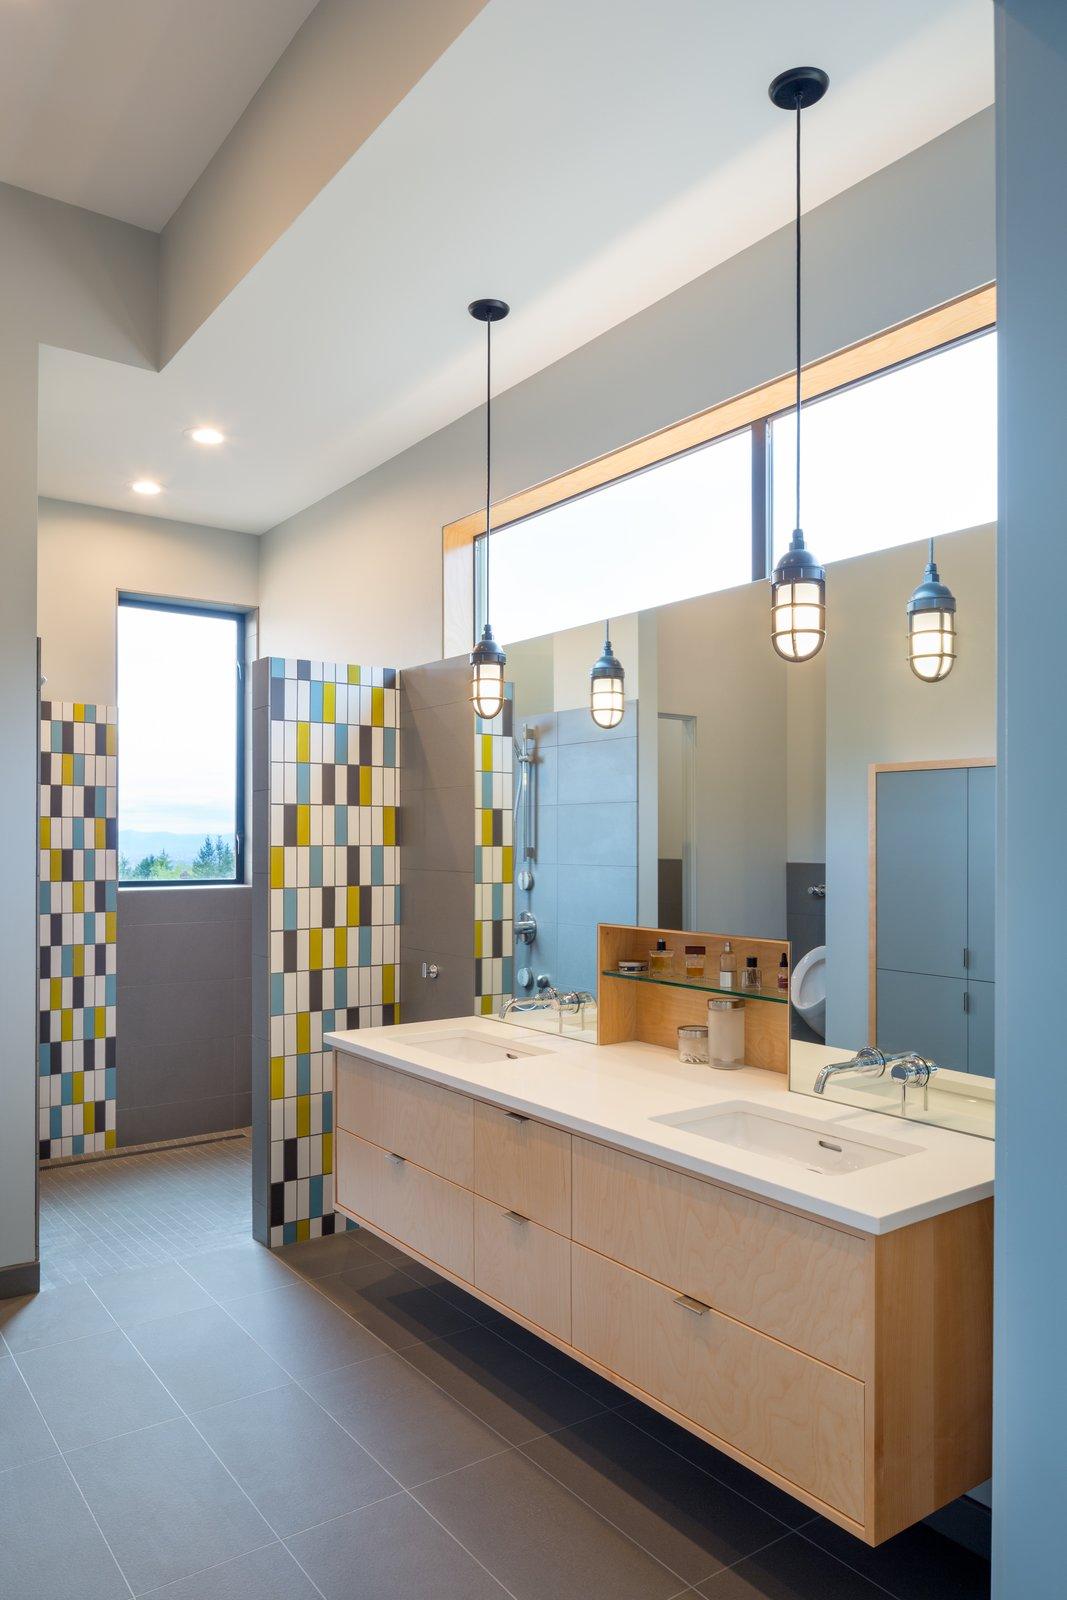 Bath Room, Quartzite Counter, Undermount Sink, Open Shower, Recessed Lighting, Porcelain Tile Wall, Porcelain Tile Floor, and Pendant Lighting Master bathroom  Panavista Hill House by Steelhead Architecture